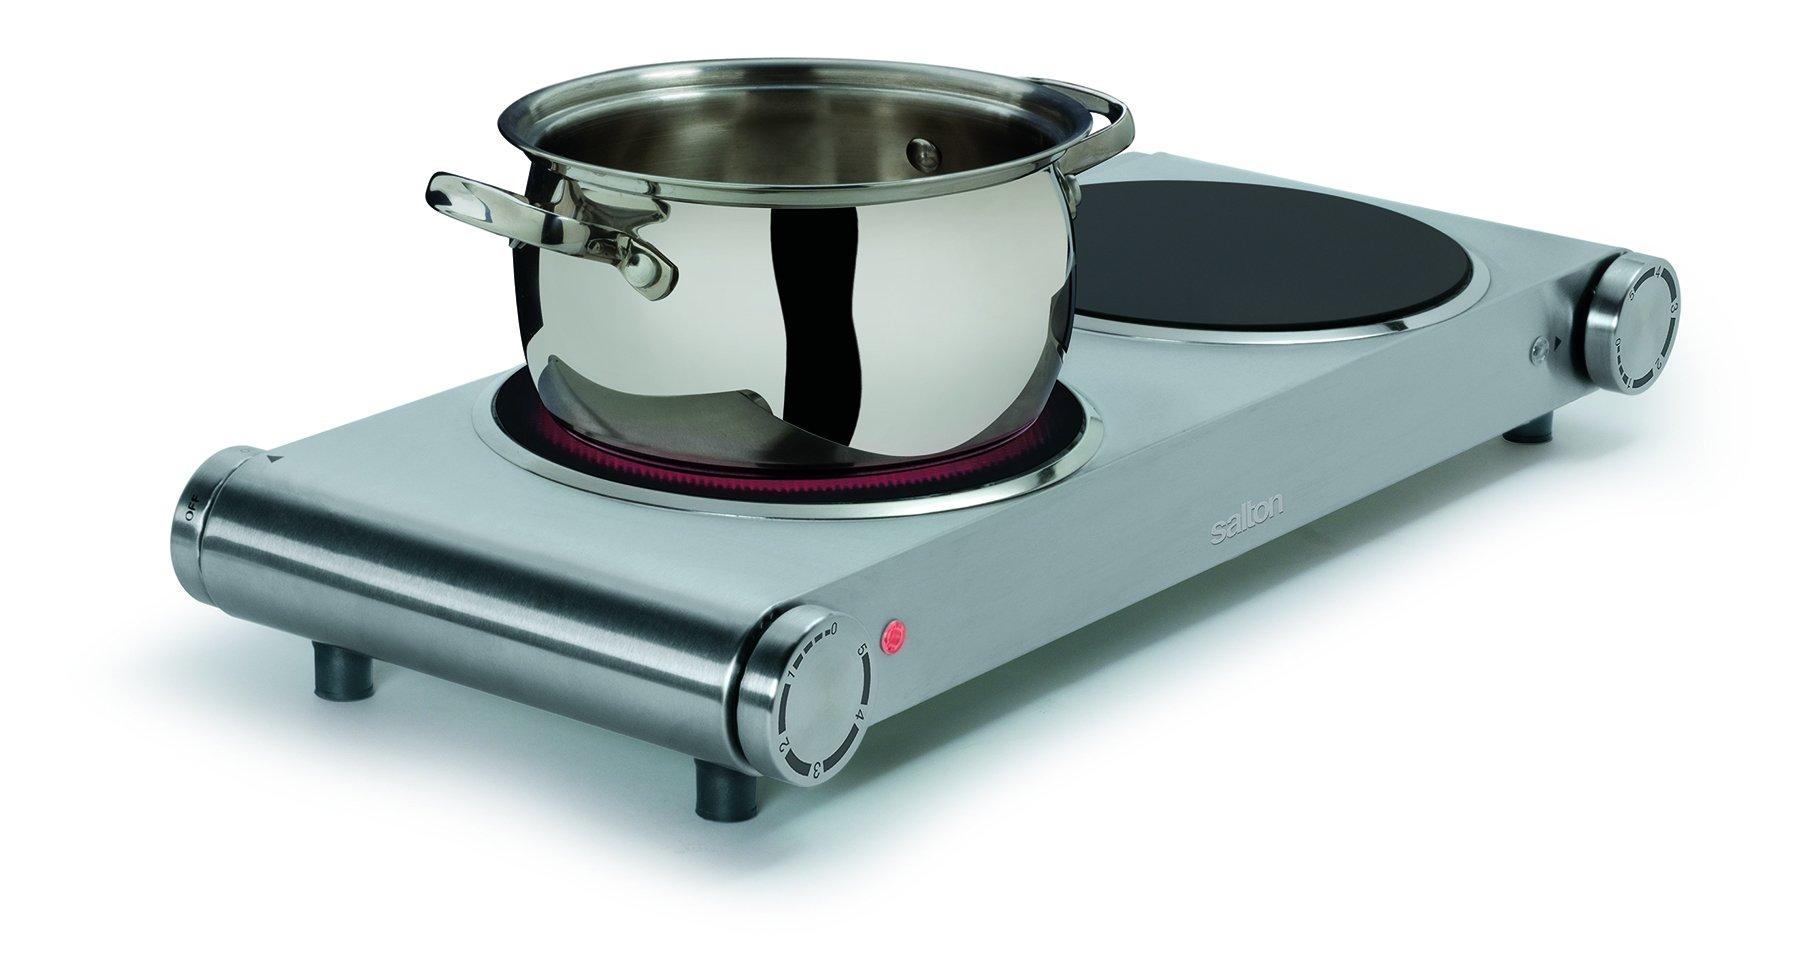 Salton HP1269 Double Burner Infrared Cooking Range, Stainless Steel by Salton (Image #2)